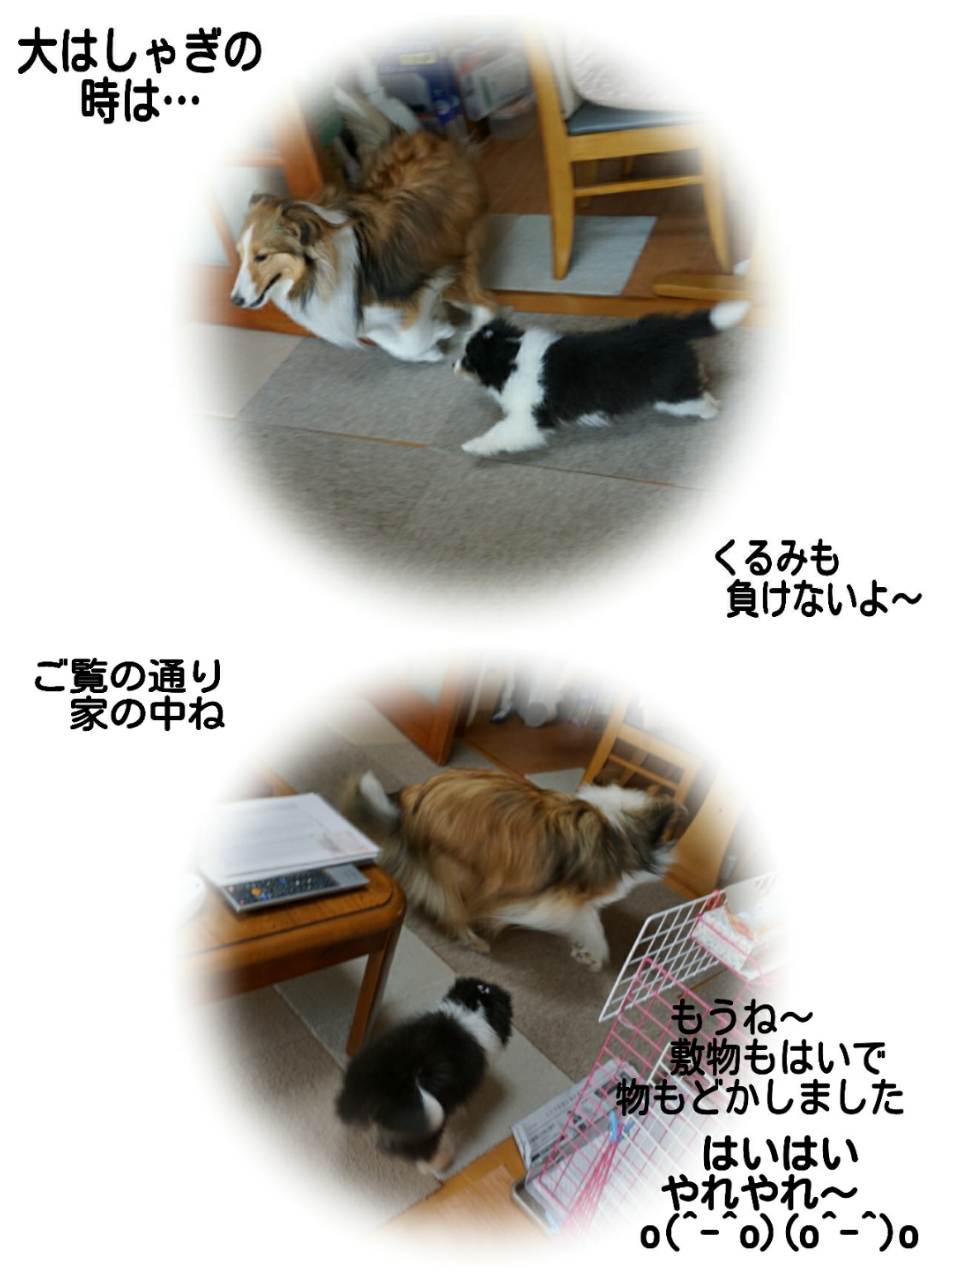 2015-05-08-05-13-15_deco.jpg